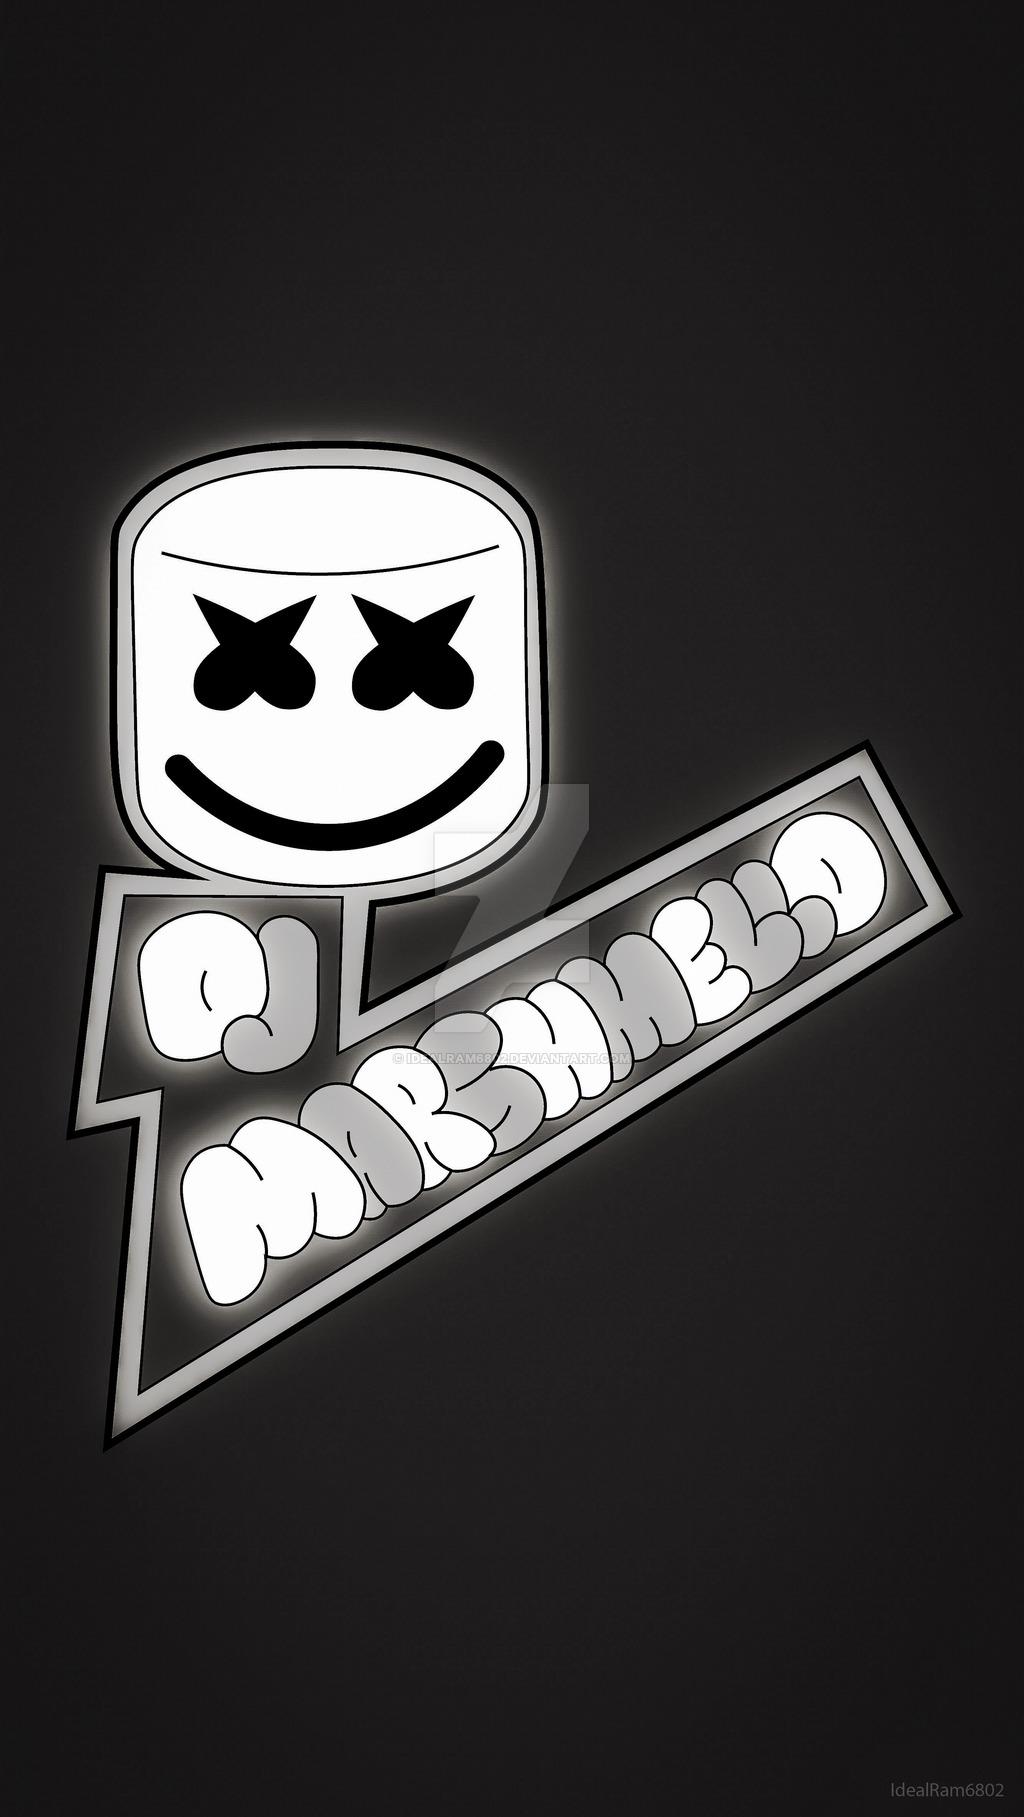 Dj Marshmello Phone Wallpaper By Idealram X